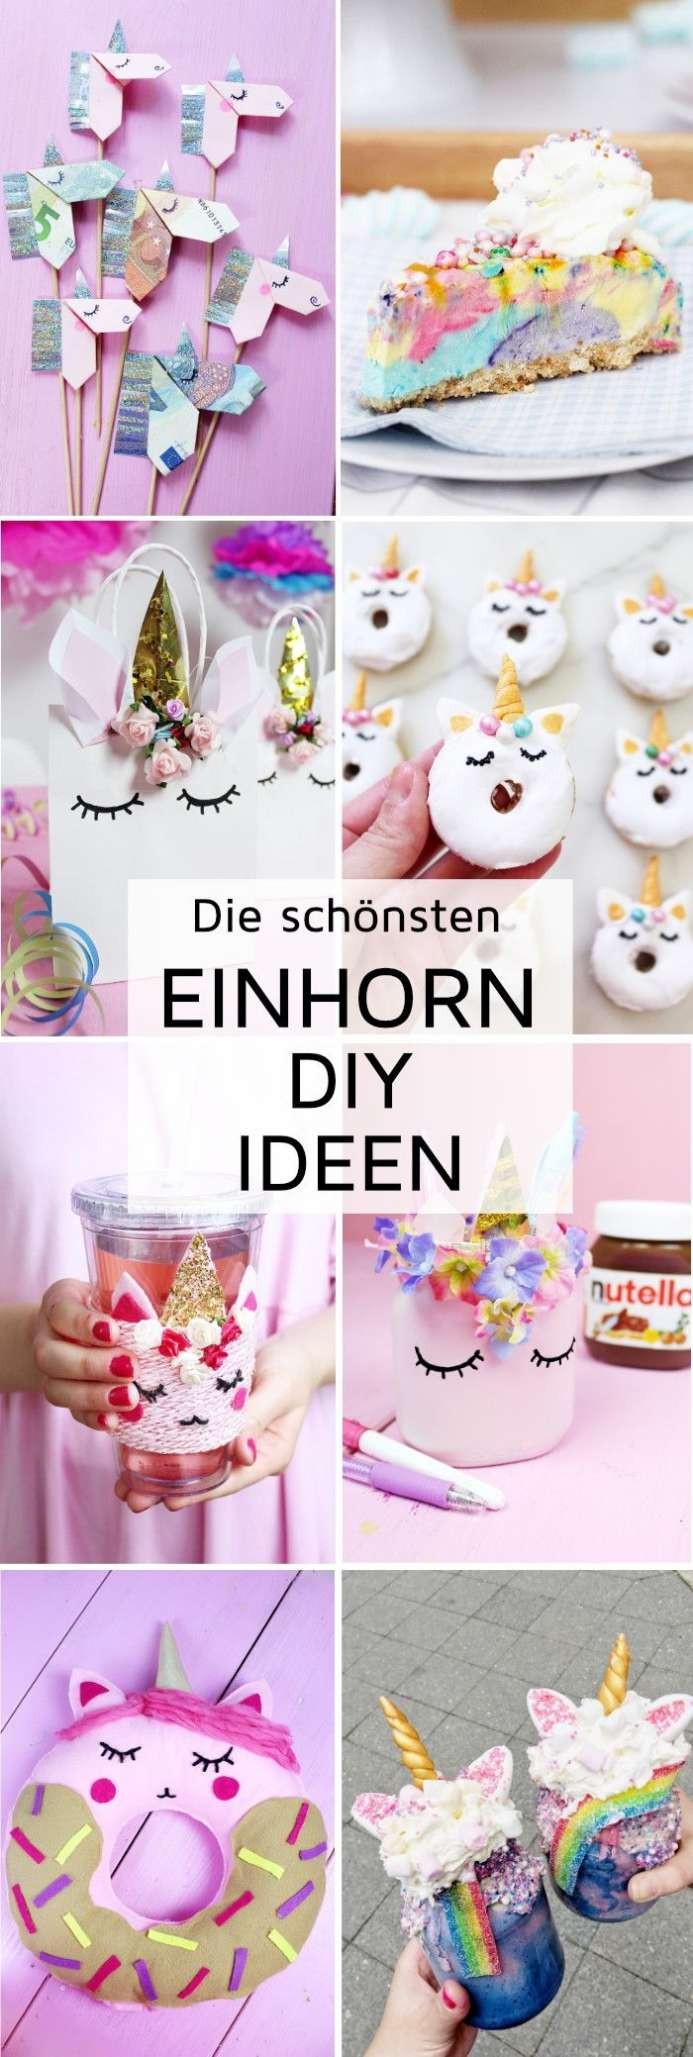 Geschenke Zum 25. Geburtstag  1 Geburtstag Deko Selber Machen Home Ideen